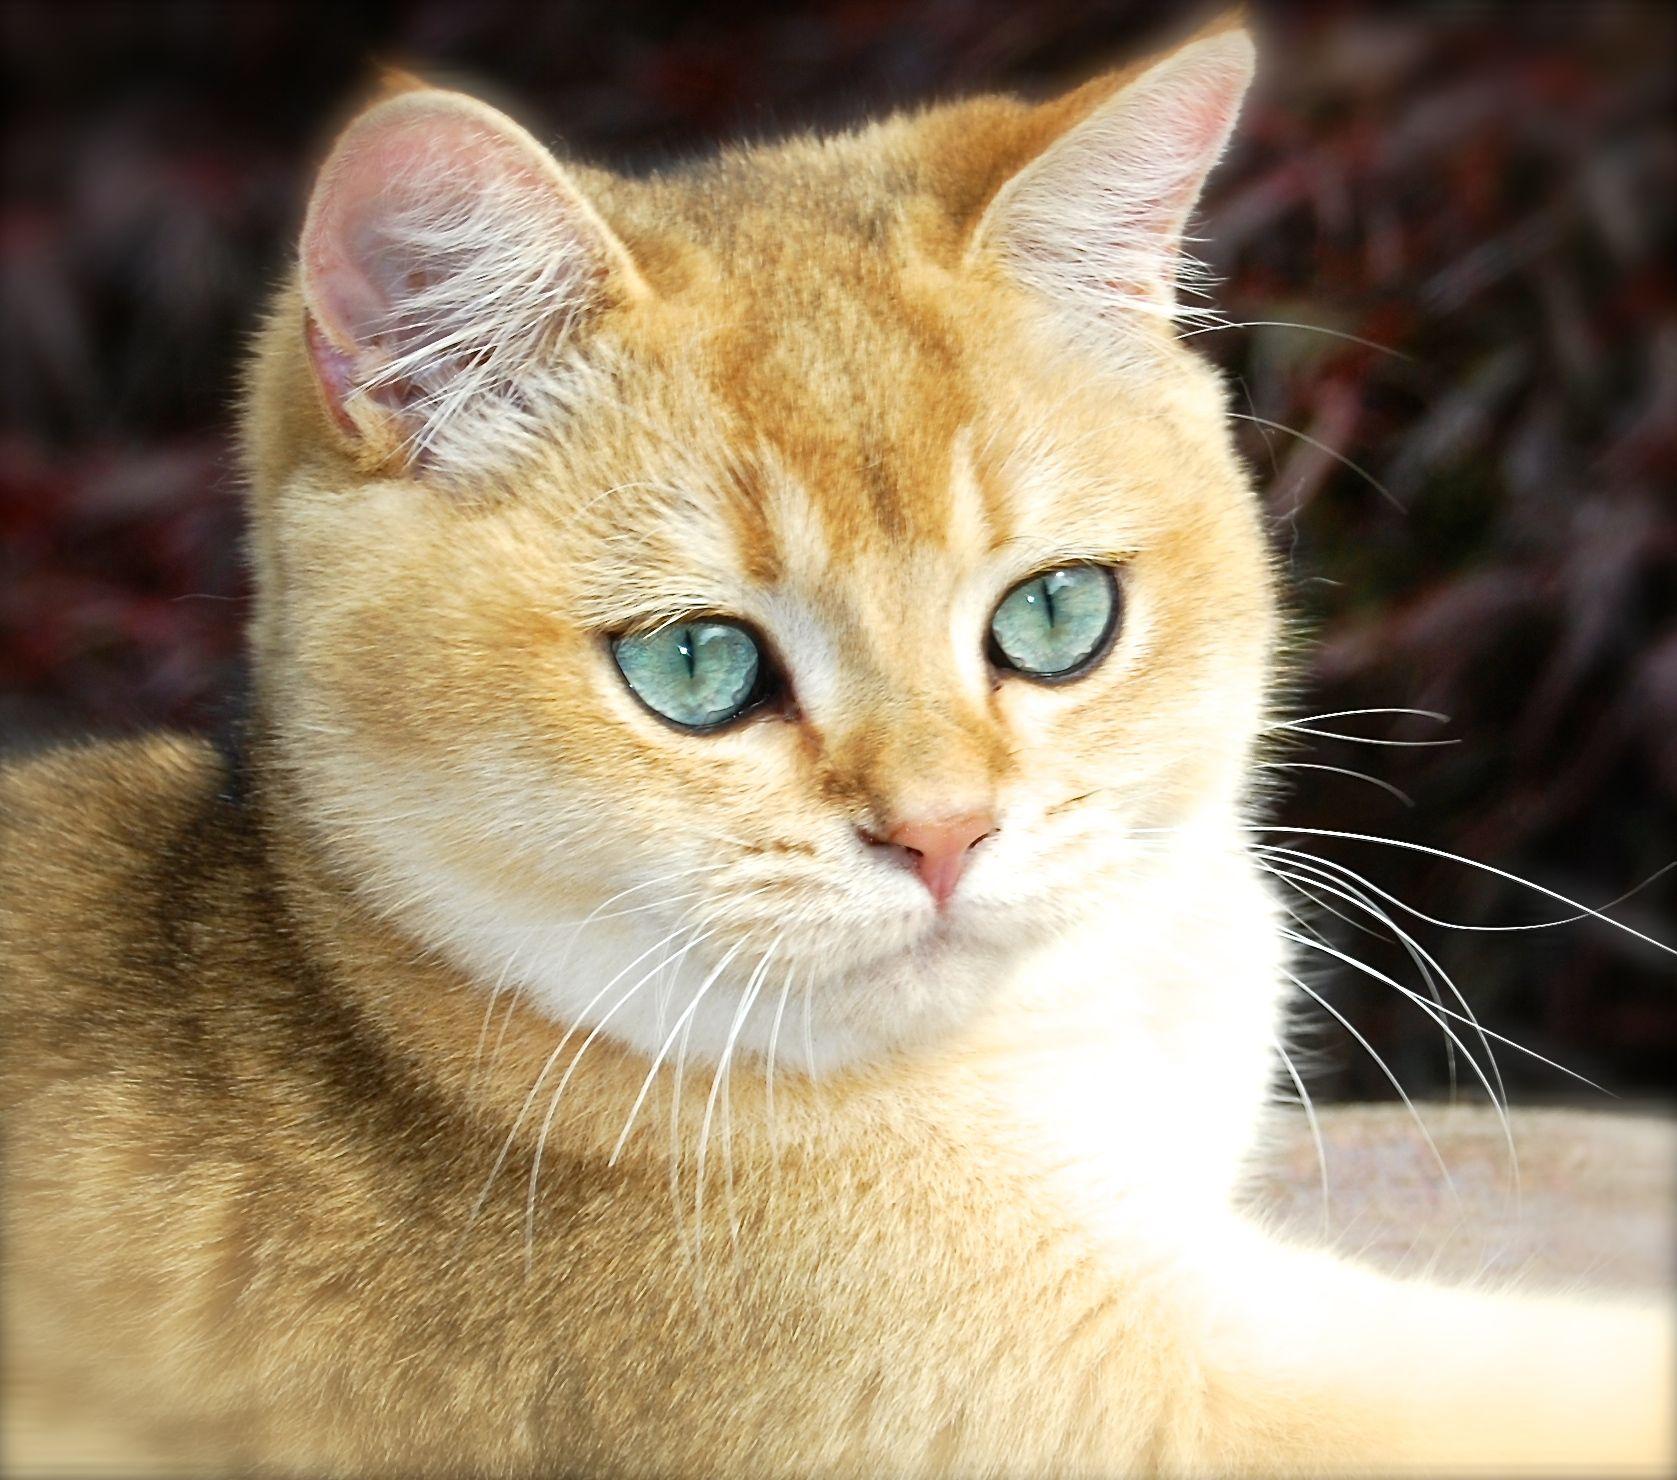 Aurum Golden Shaded British Shorthair British Shorthair British